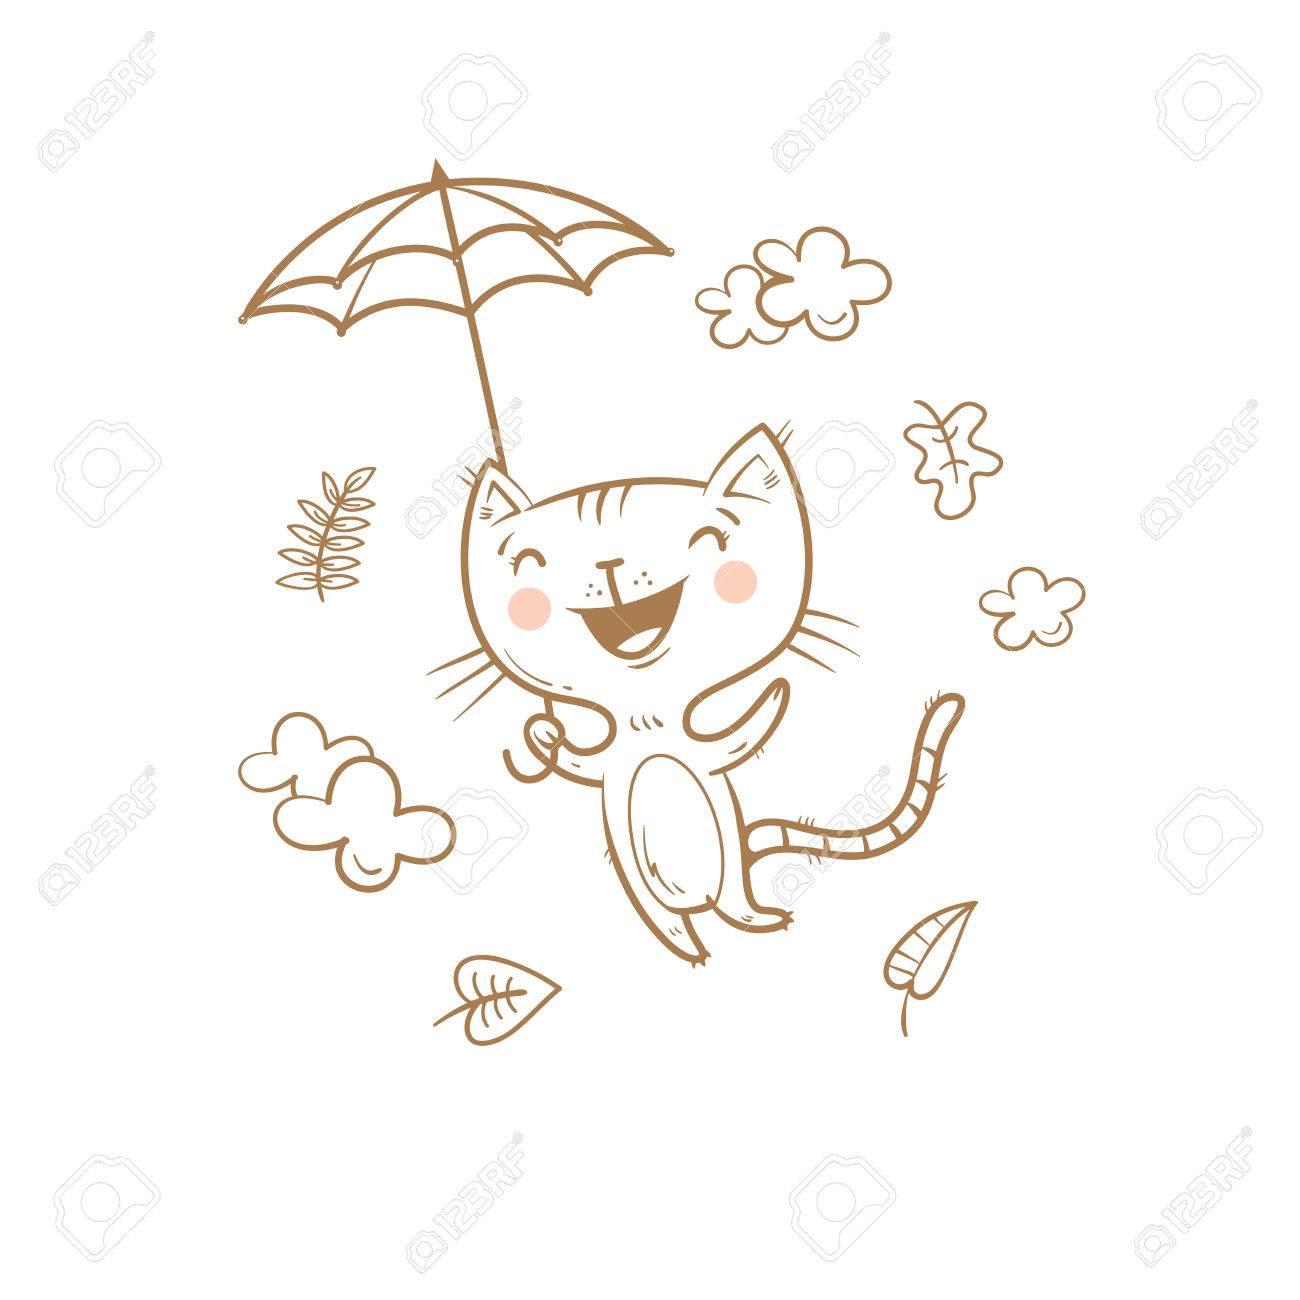 Image of: Pictures Cute Cartoon Cat Under An Umbrella Flying Kitten Autumn Season Windy Weather And 123rfcom Cute Cartoon Cat Under An Umbrella Flying Kitten Autumn Season